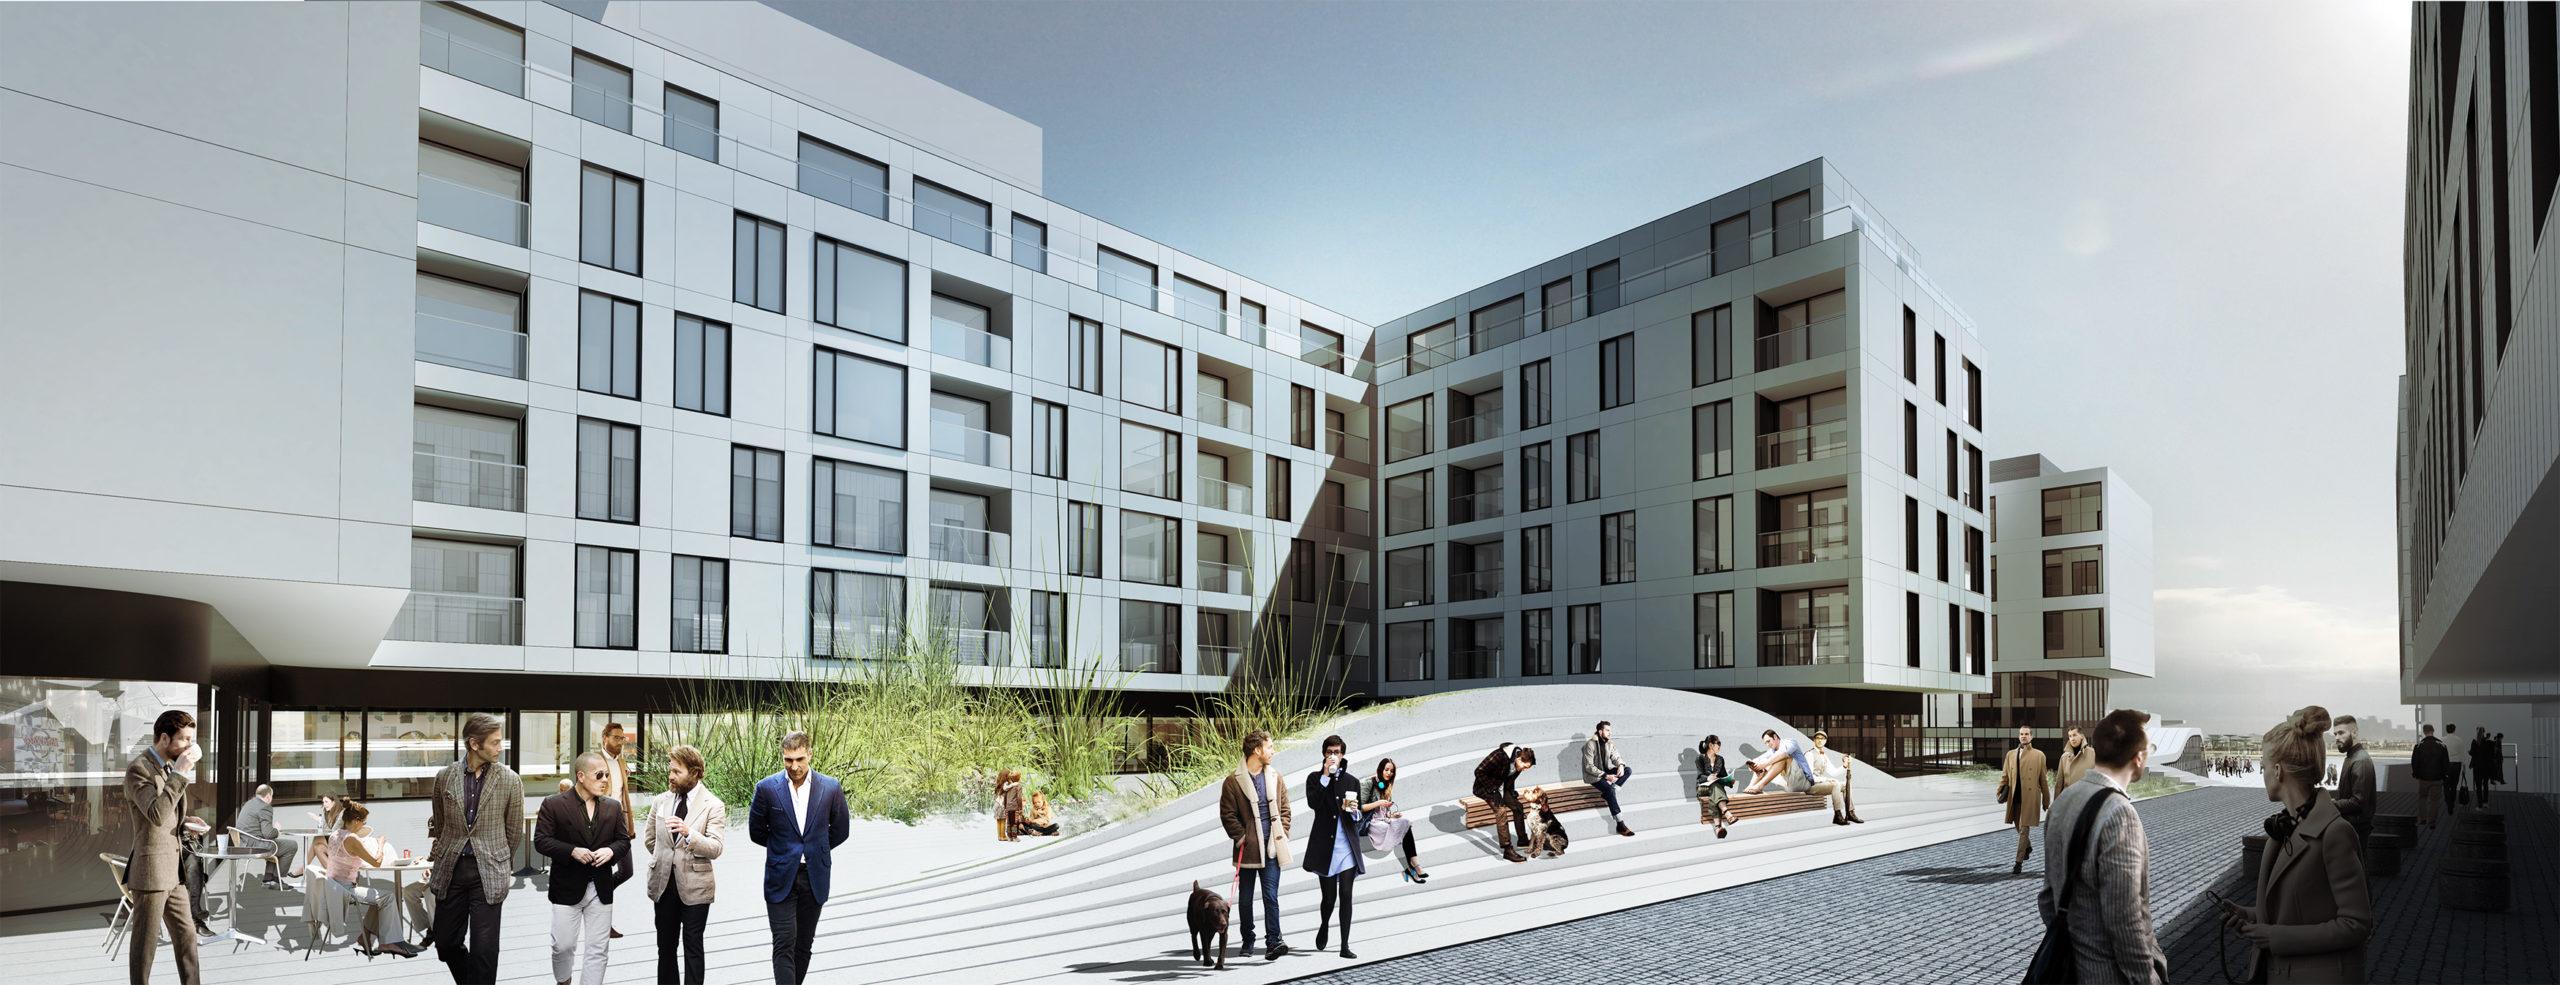 GDYNIA-Waterfront-Housing-MJZ-3